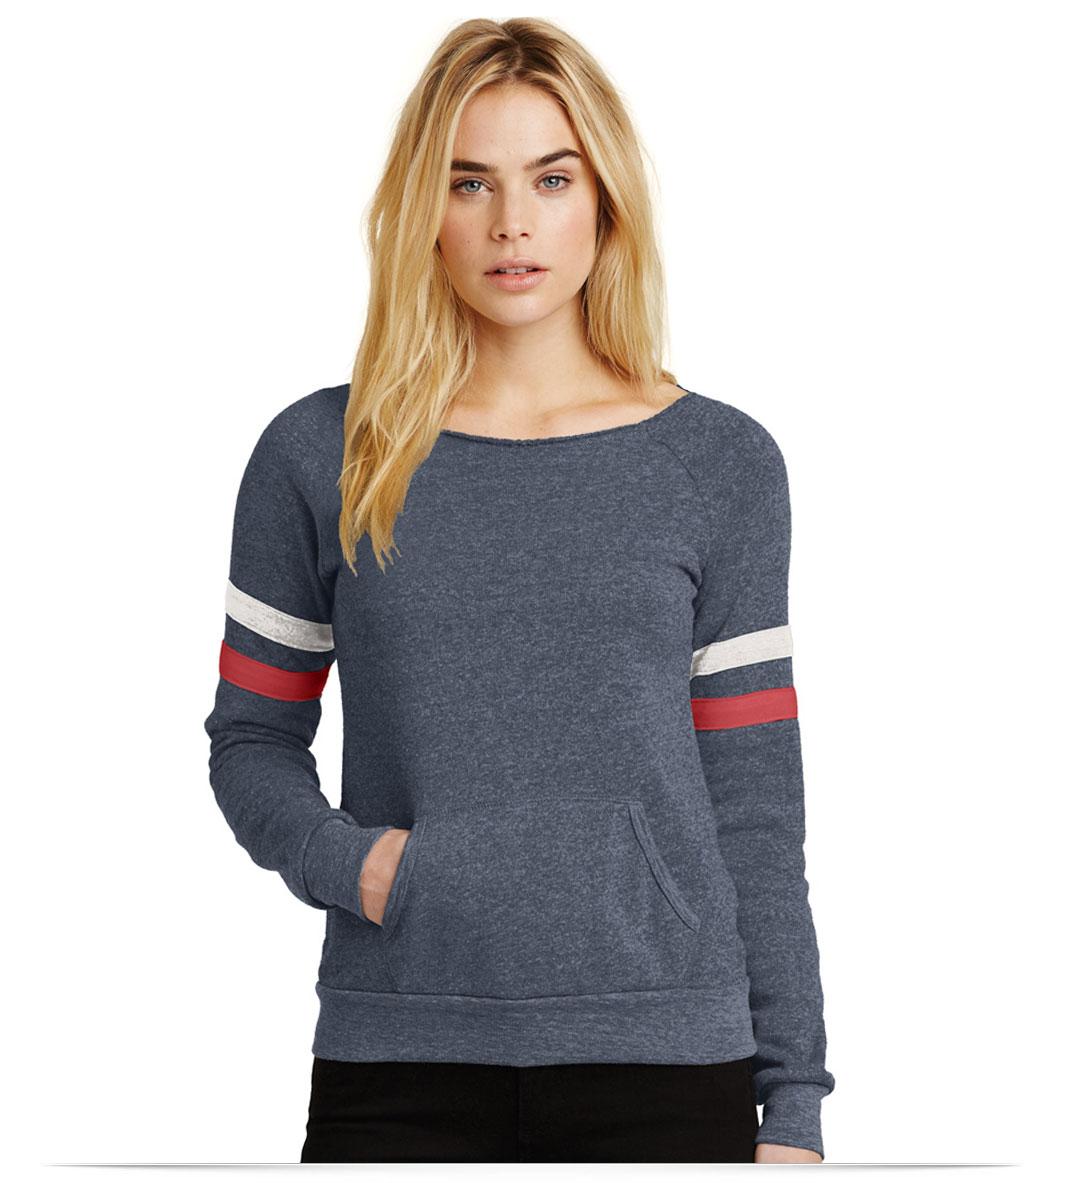 Personalized Alternative Sport Eco-Fleece Sweatshirt